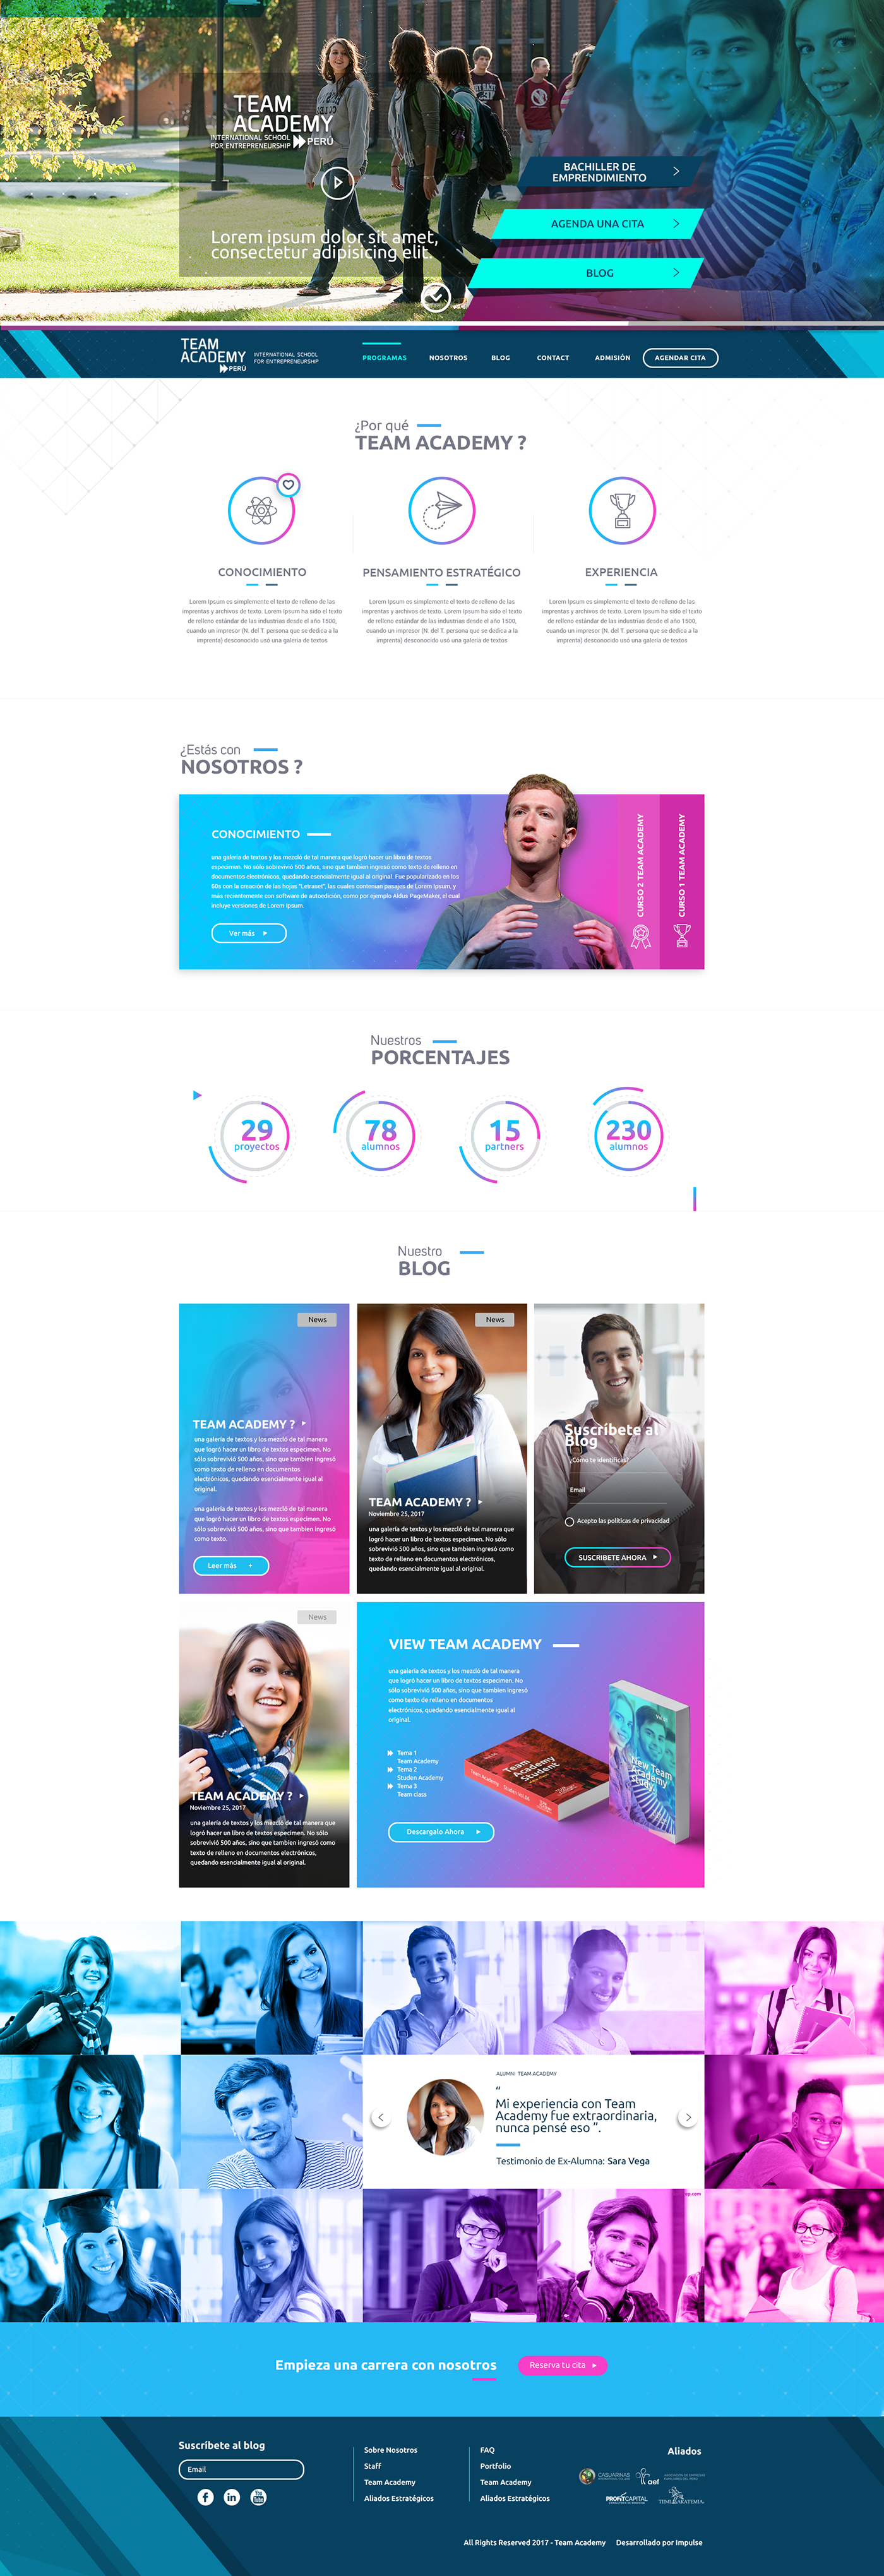 web desin design Web ux UI colors user interface mobile